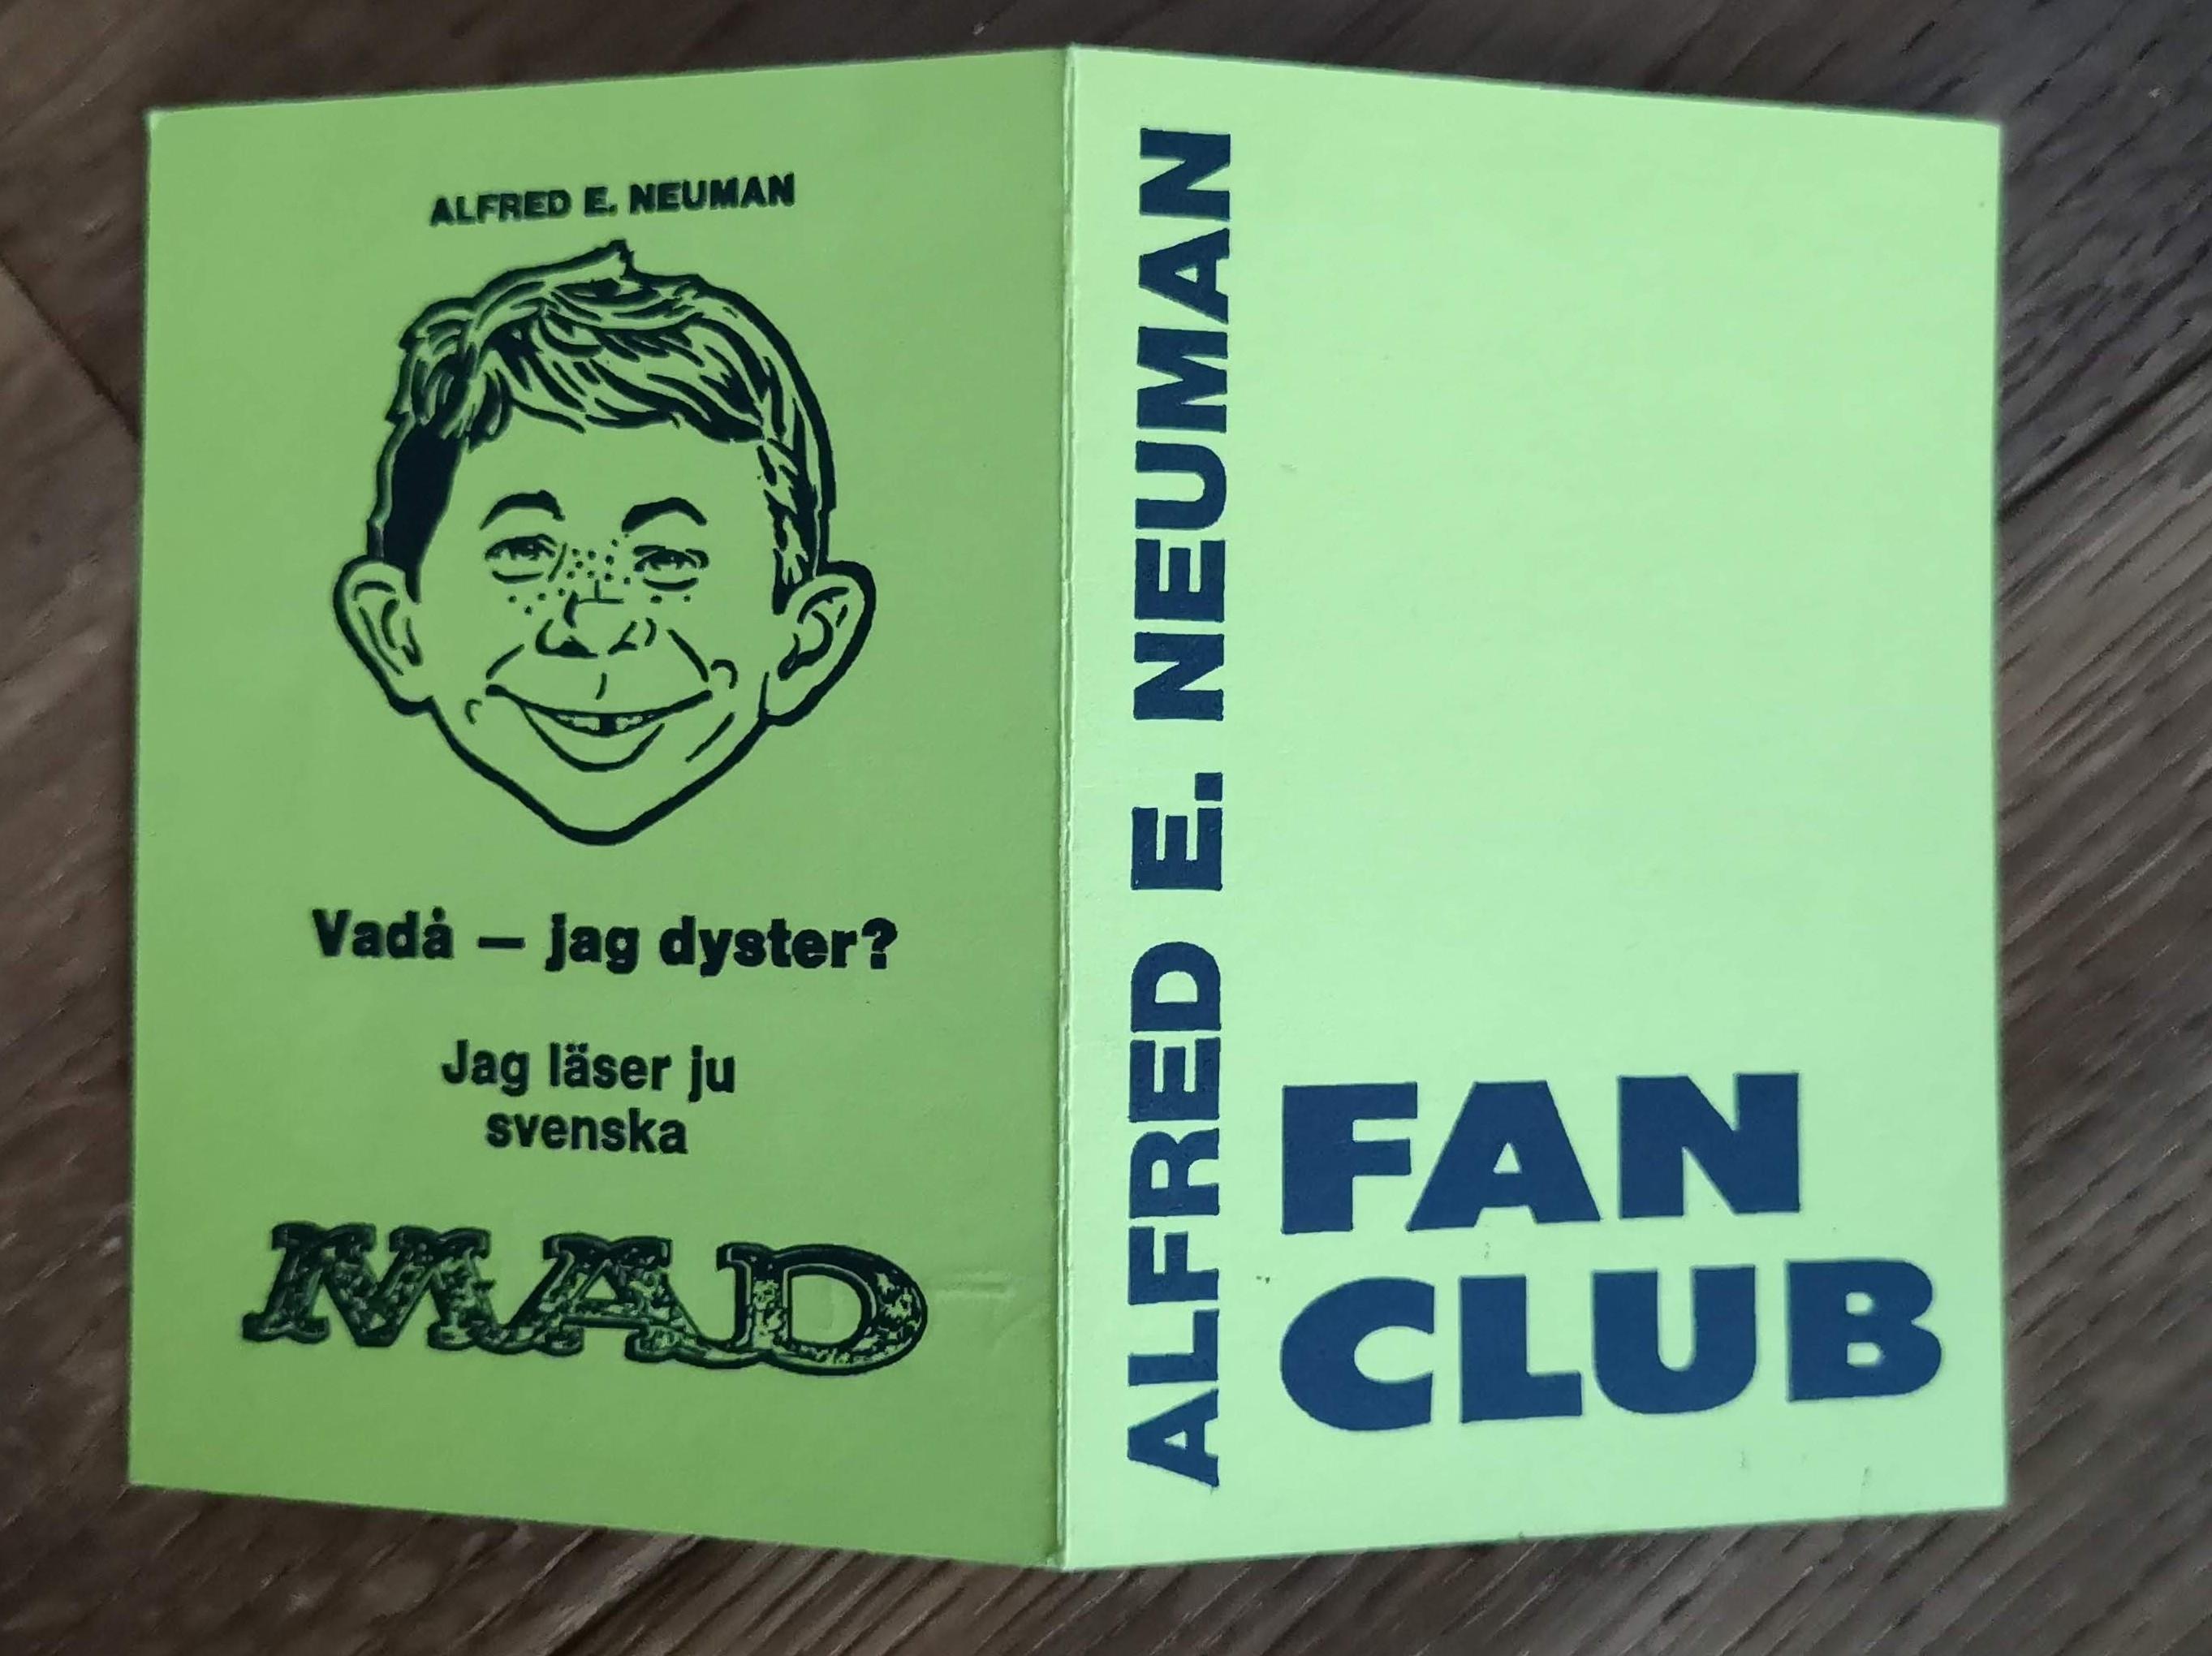 Membership Card Alfred E. Neuman Fan Club • Sweden